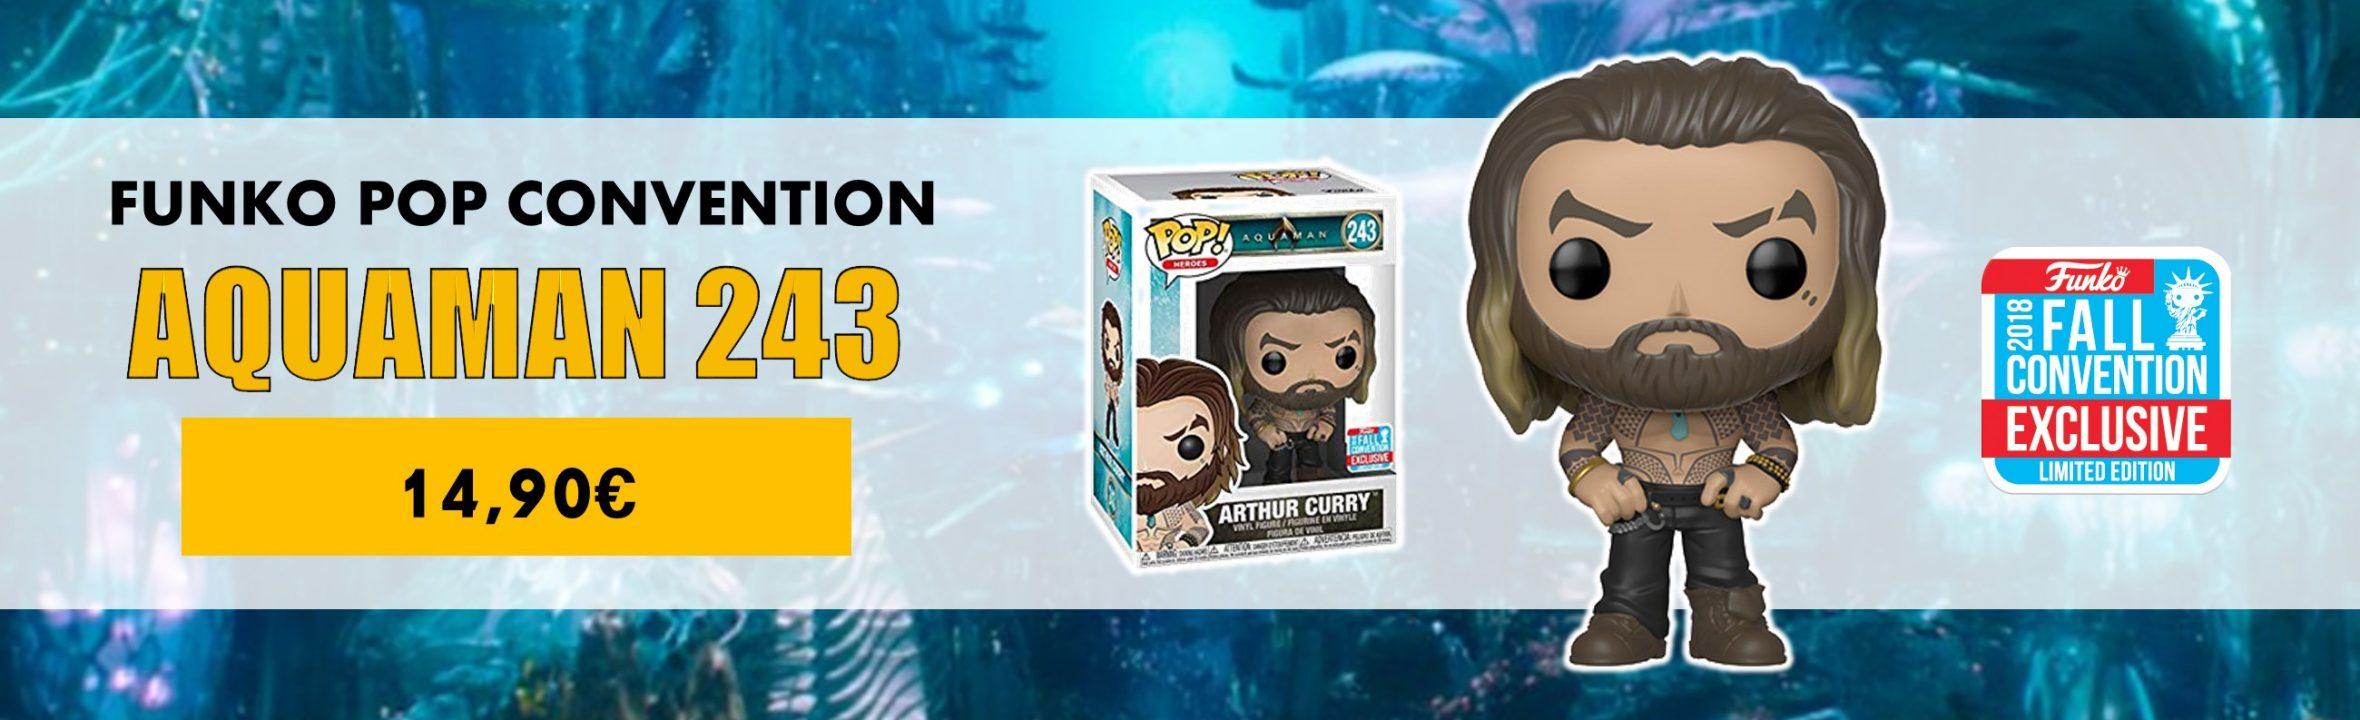 funko pop Aquaman convention Arthur Curry 243